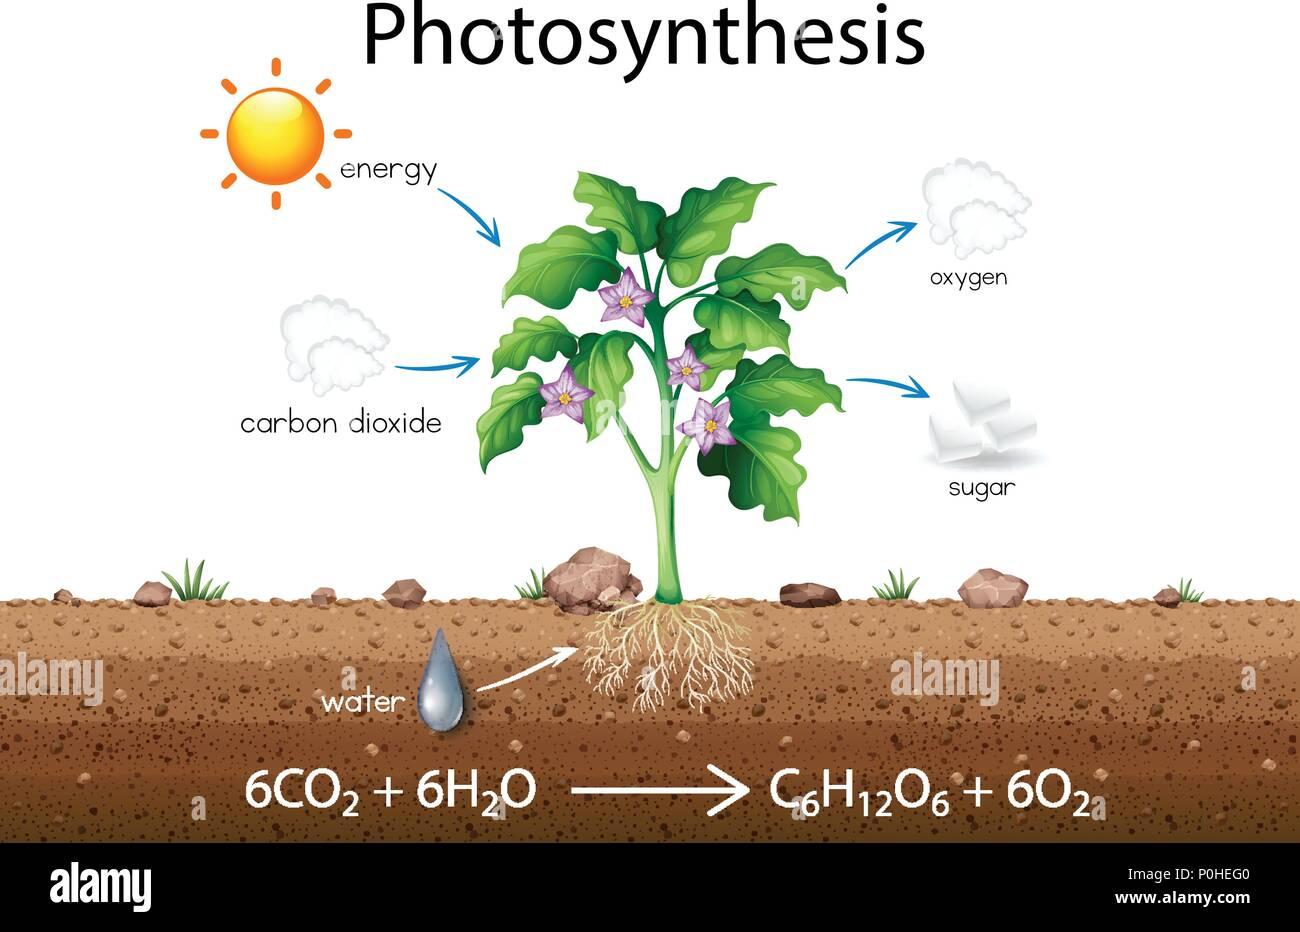 Photosynthesis Diagram Stock Photos Photosynthesis Diagram Stock